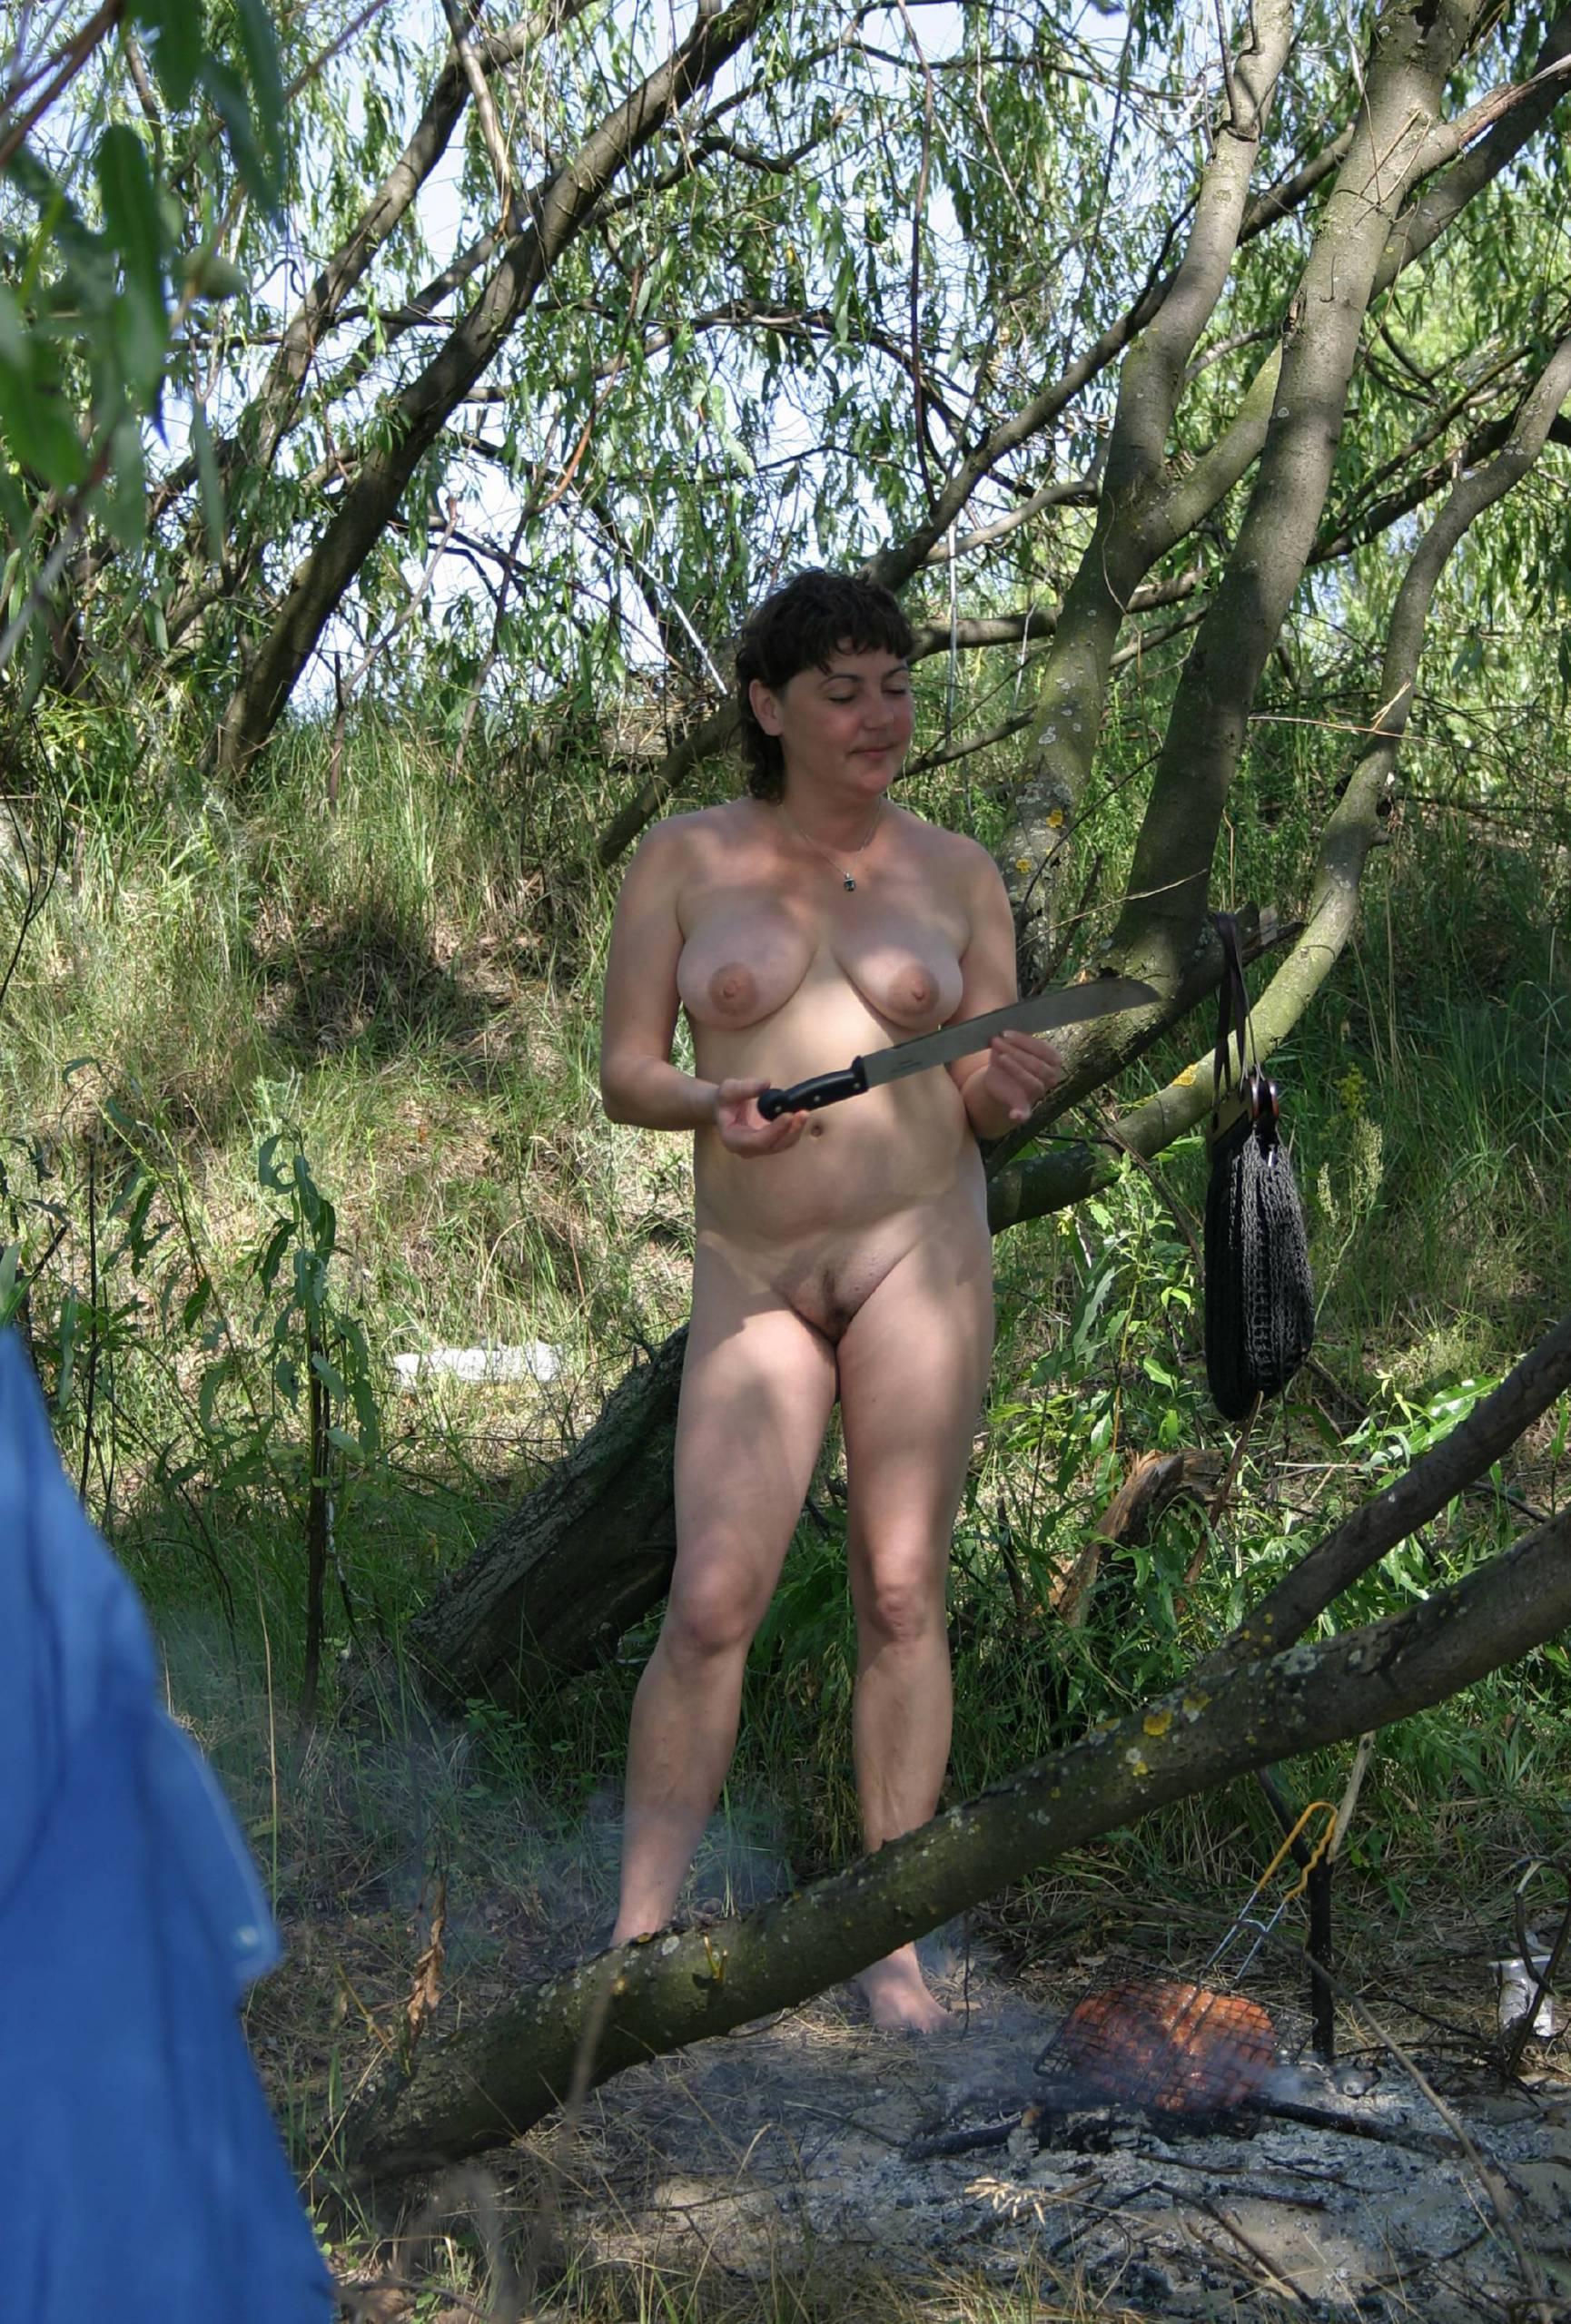 Nudist Photos Artistic Painters At Picnic - 1